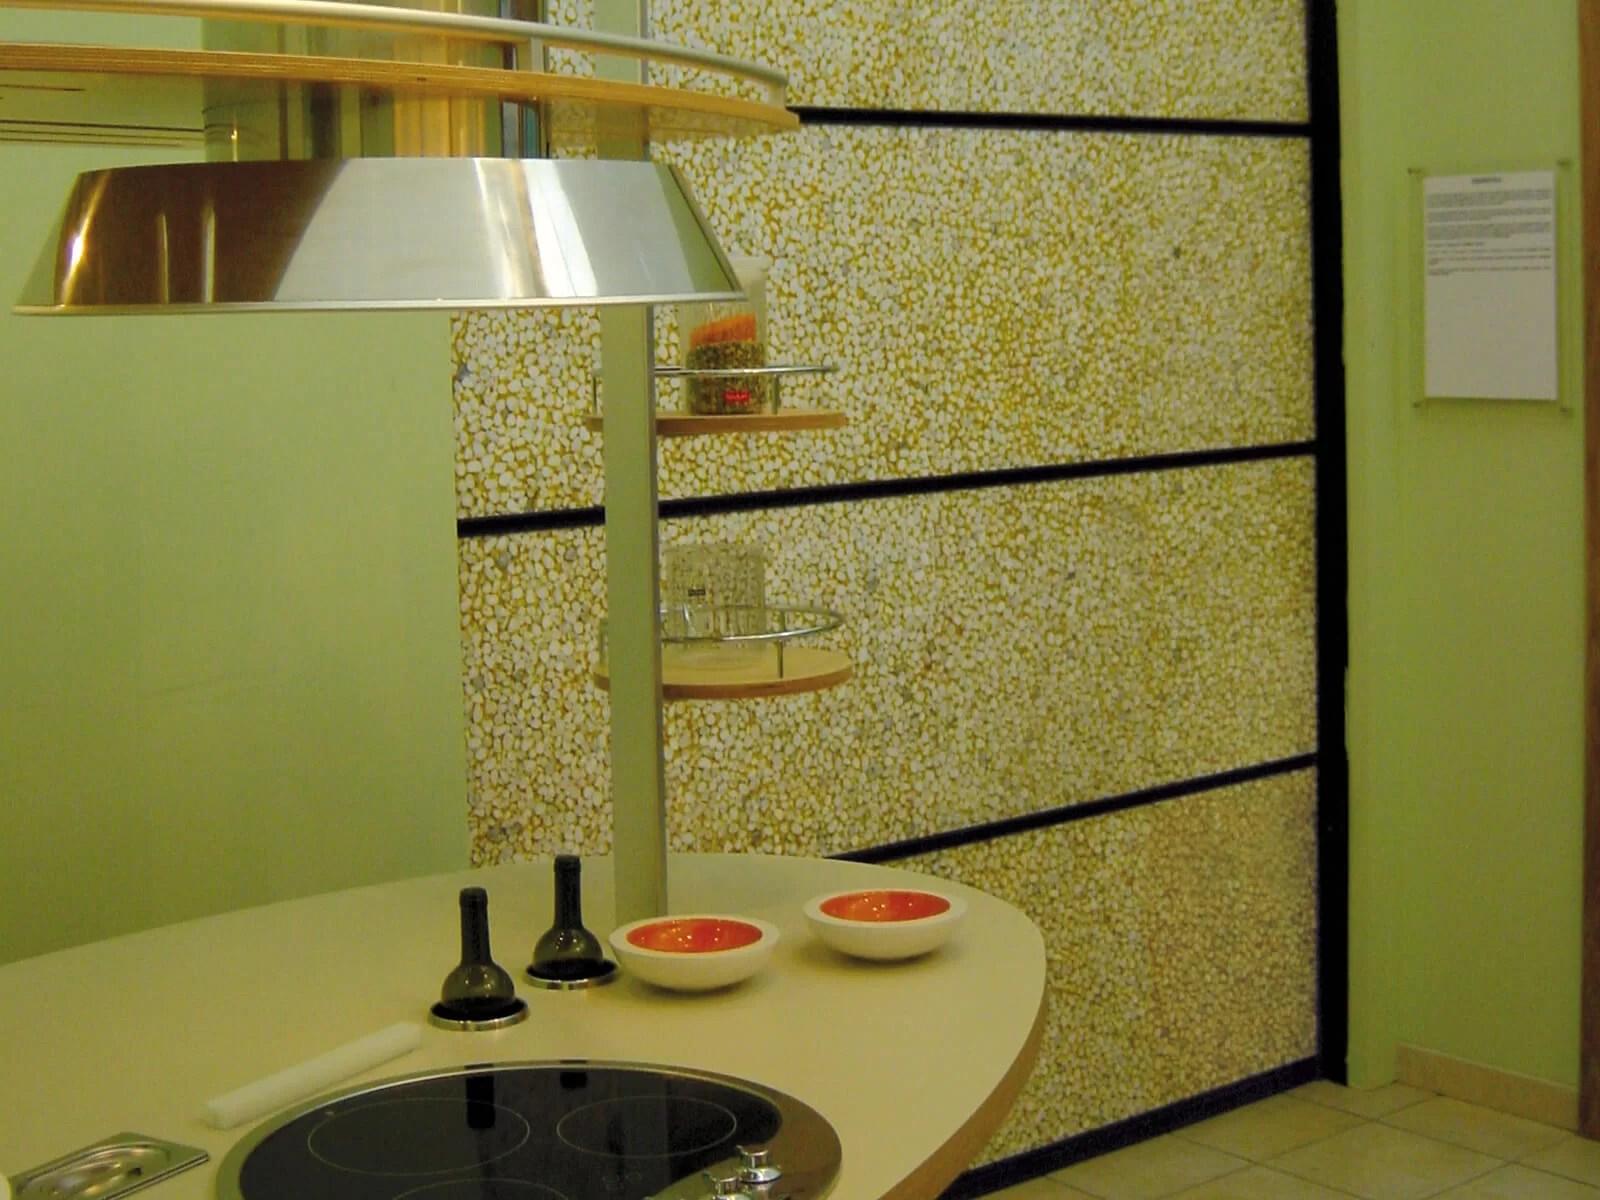 Portone di design Le Perle RESINS JEWELS - Resins - Sassi sotto resina